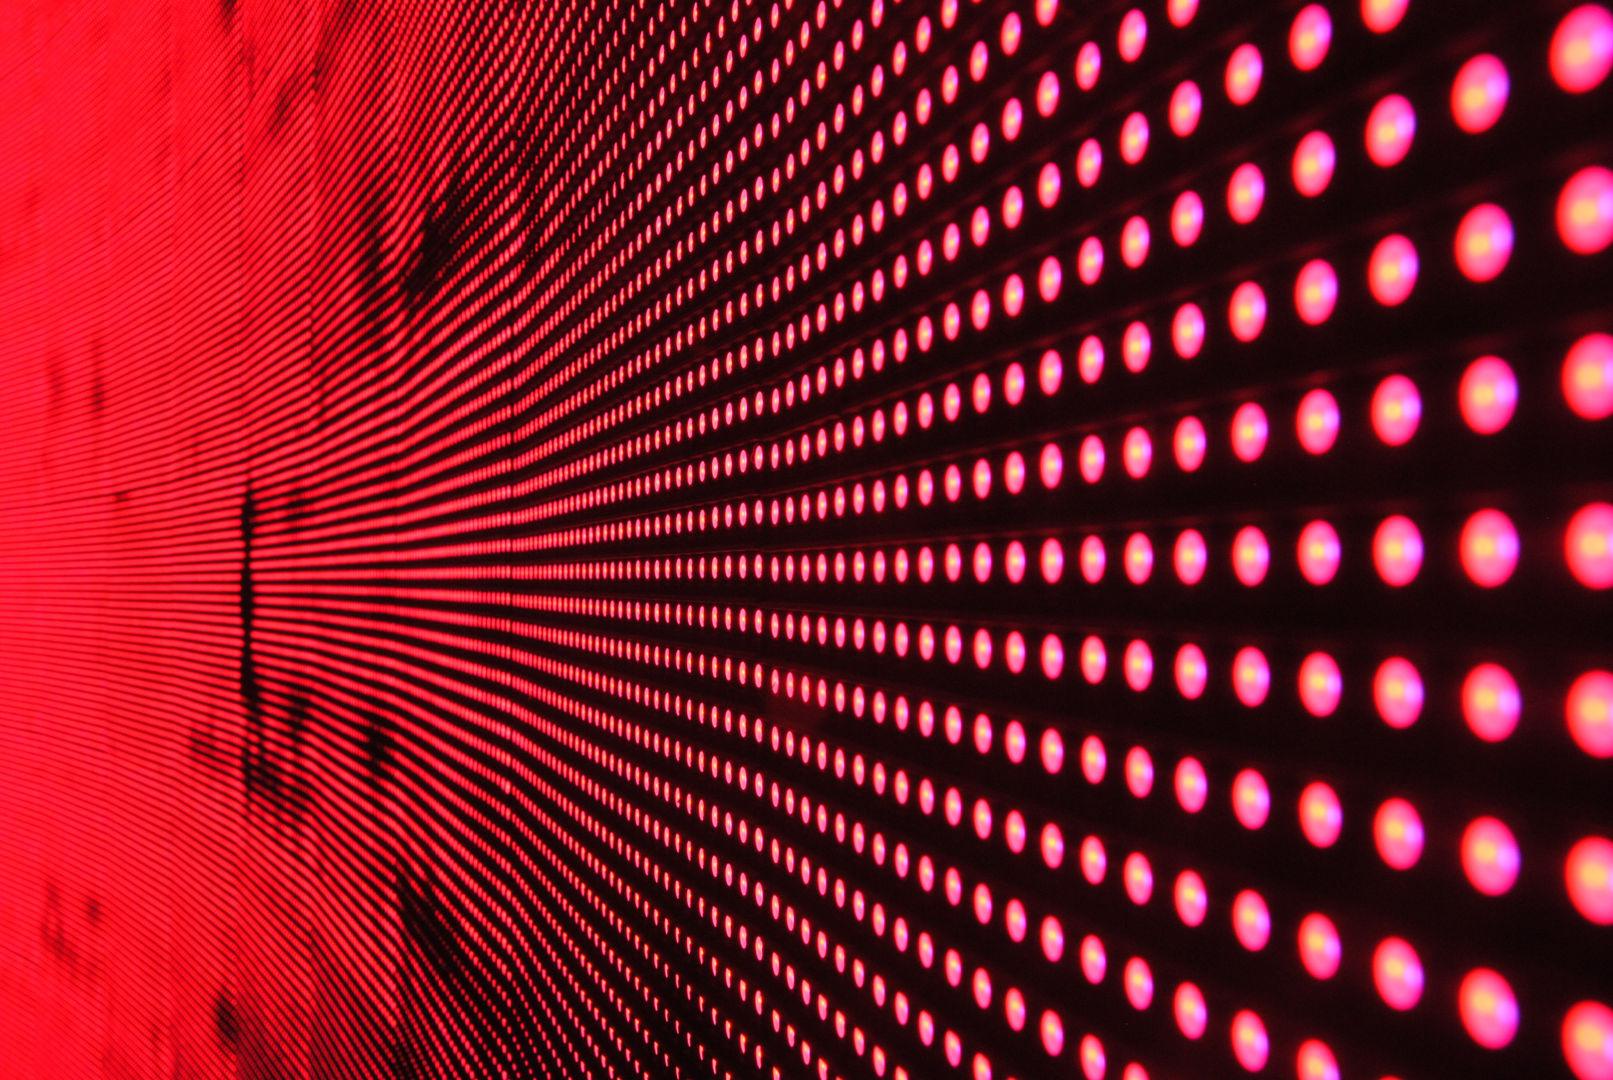 ai-art-big-data-158826.jpg